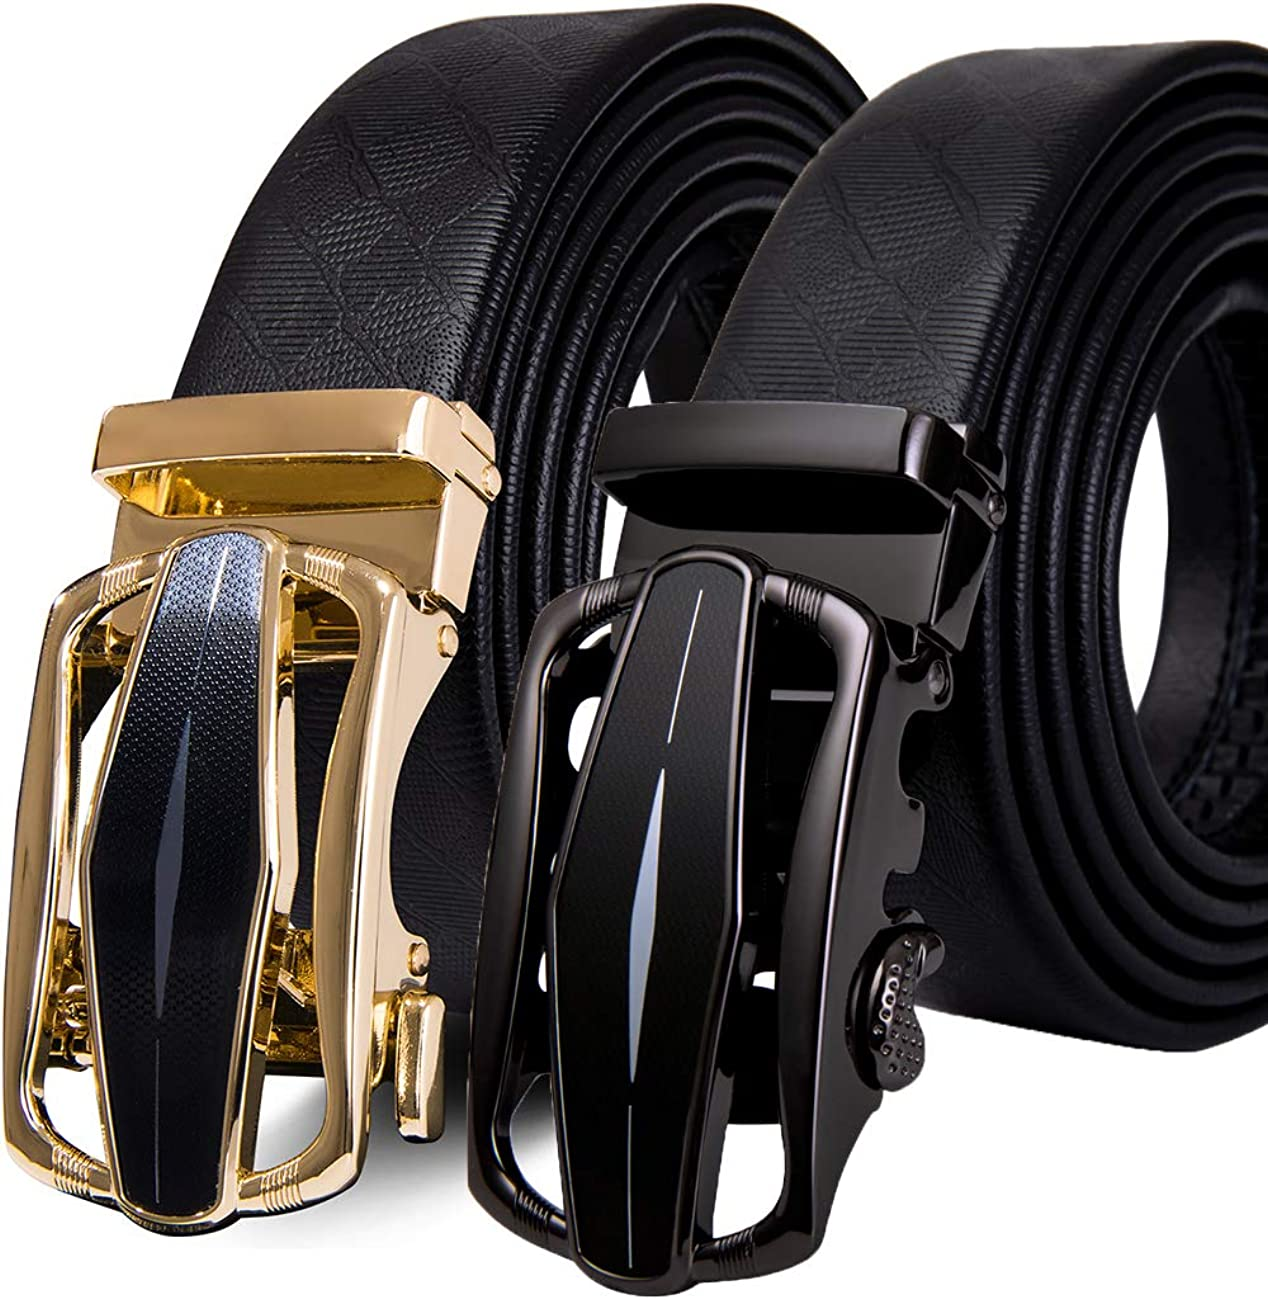 Dubulle Replacement Ratchet Belts /& Automatic Buckle Mens Leather Belt Strap 1 3//8 Sliding Click Buckle